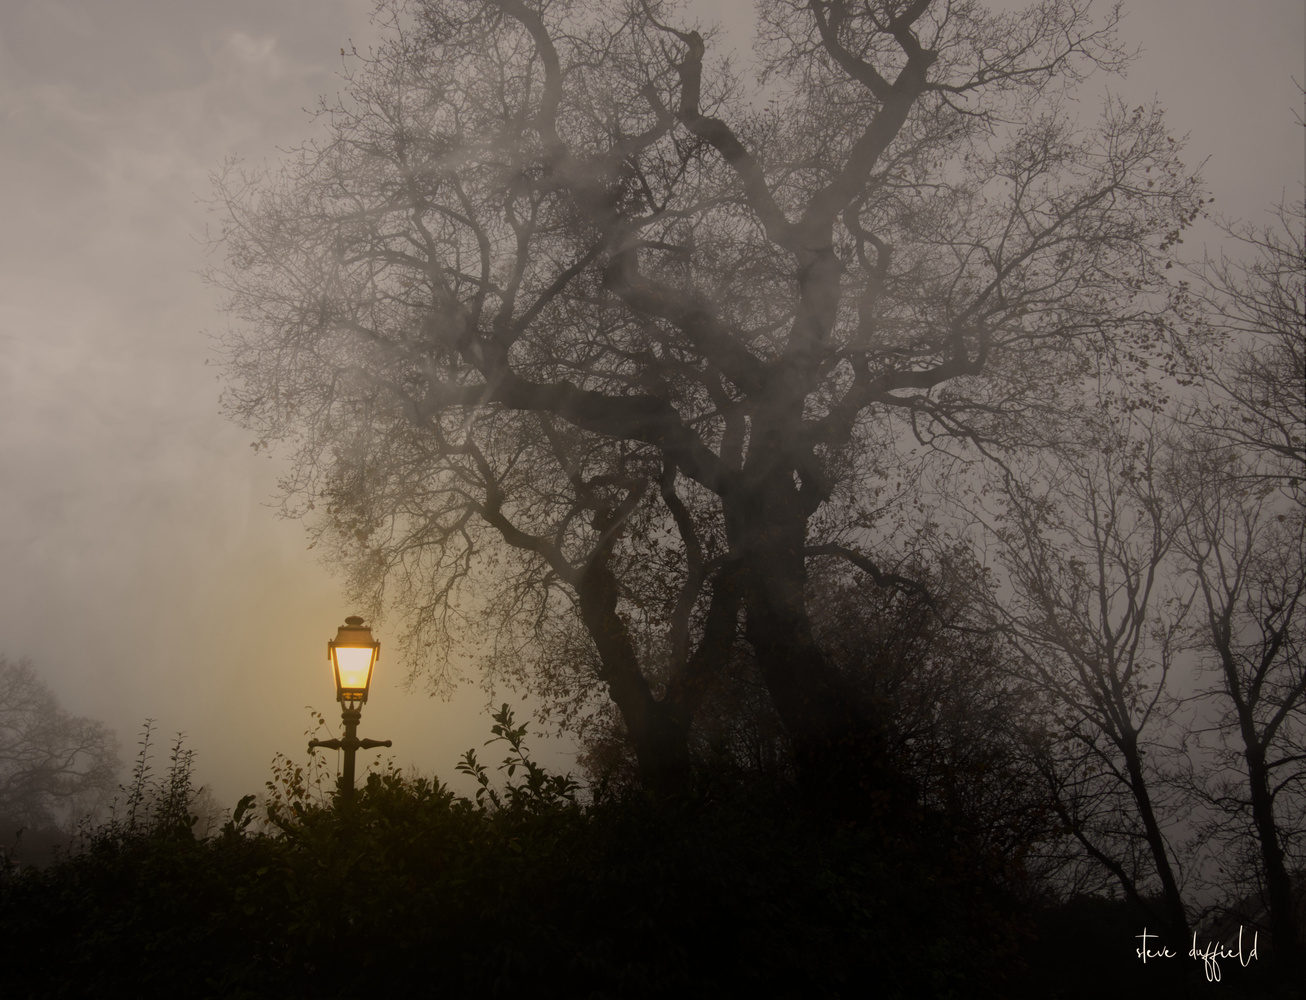 FOGGY STREET LAMP by stephen duffield